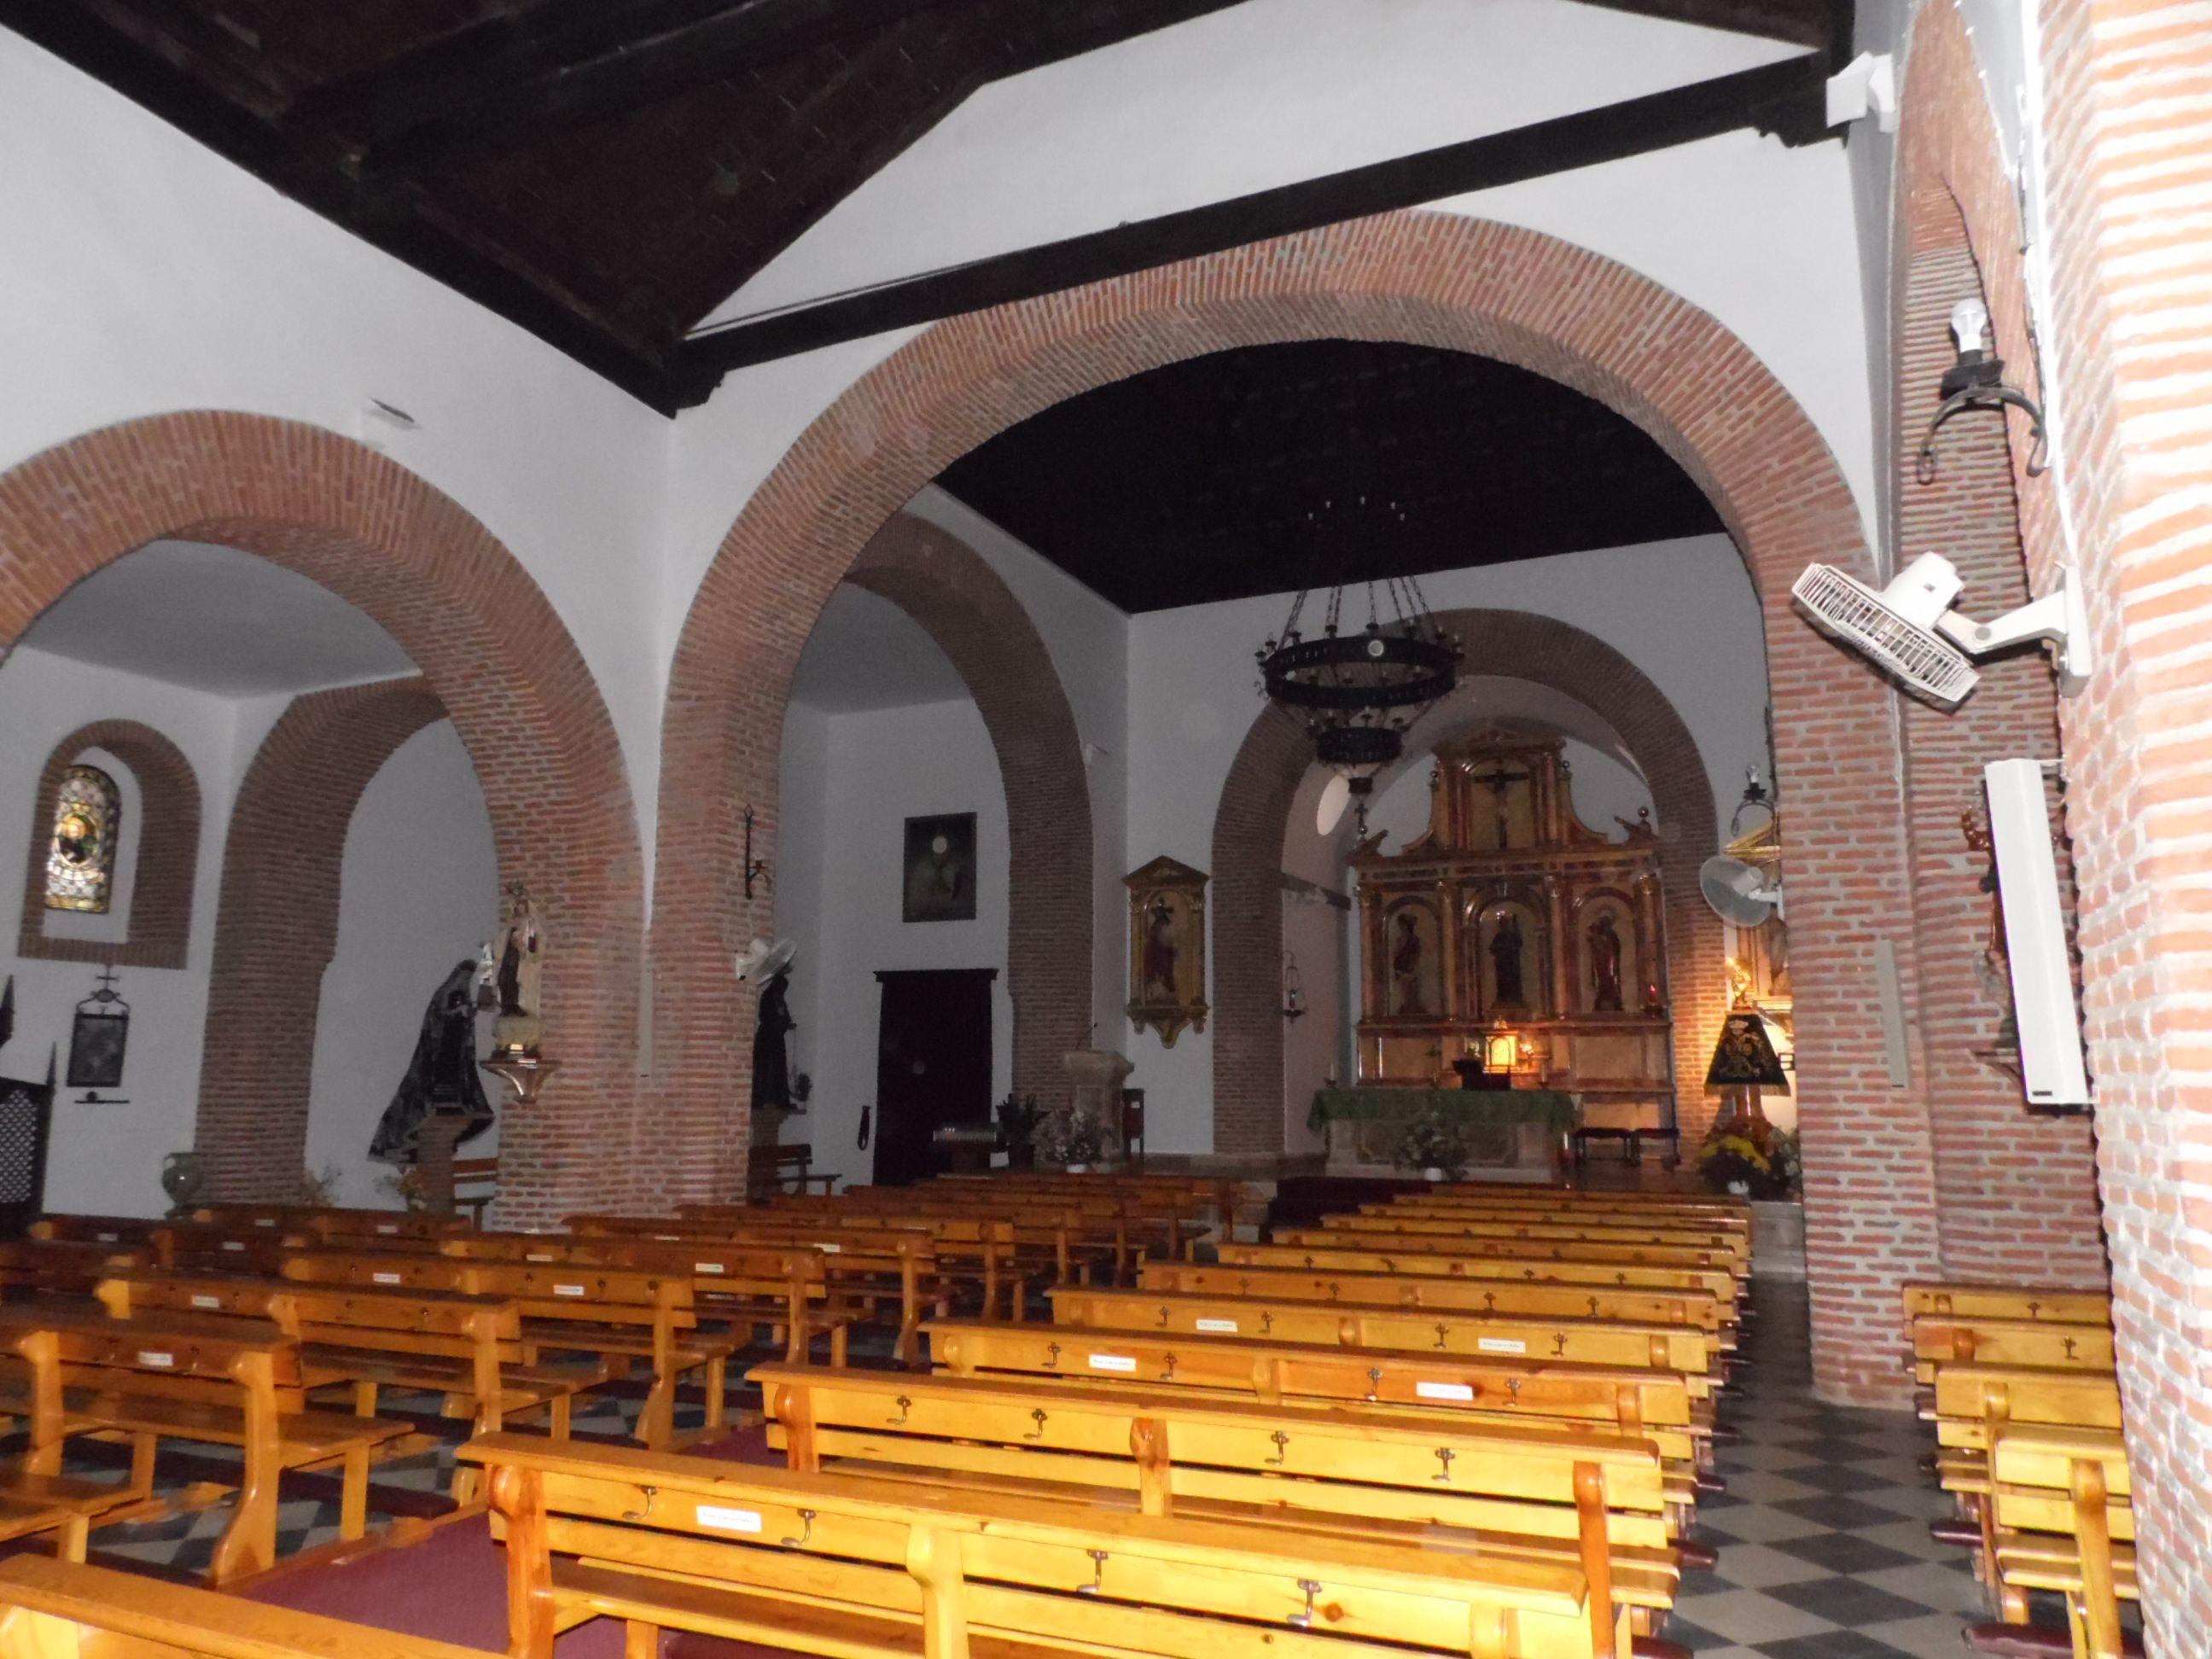 BELVÍS DE LA JARA (Toledo) - Iglesia de San Andrés Apóstol (4) | San andres  apostol, Andres apostol, Toledo